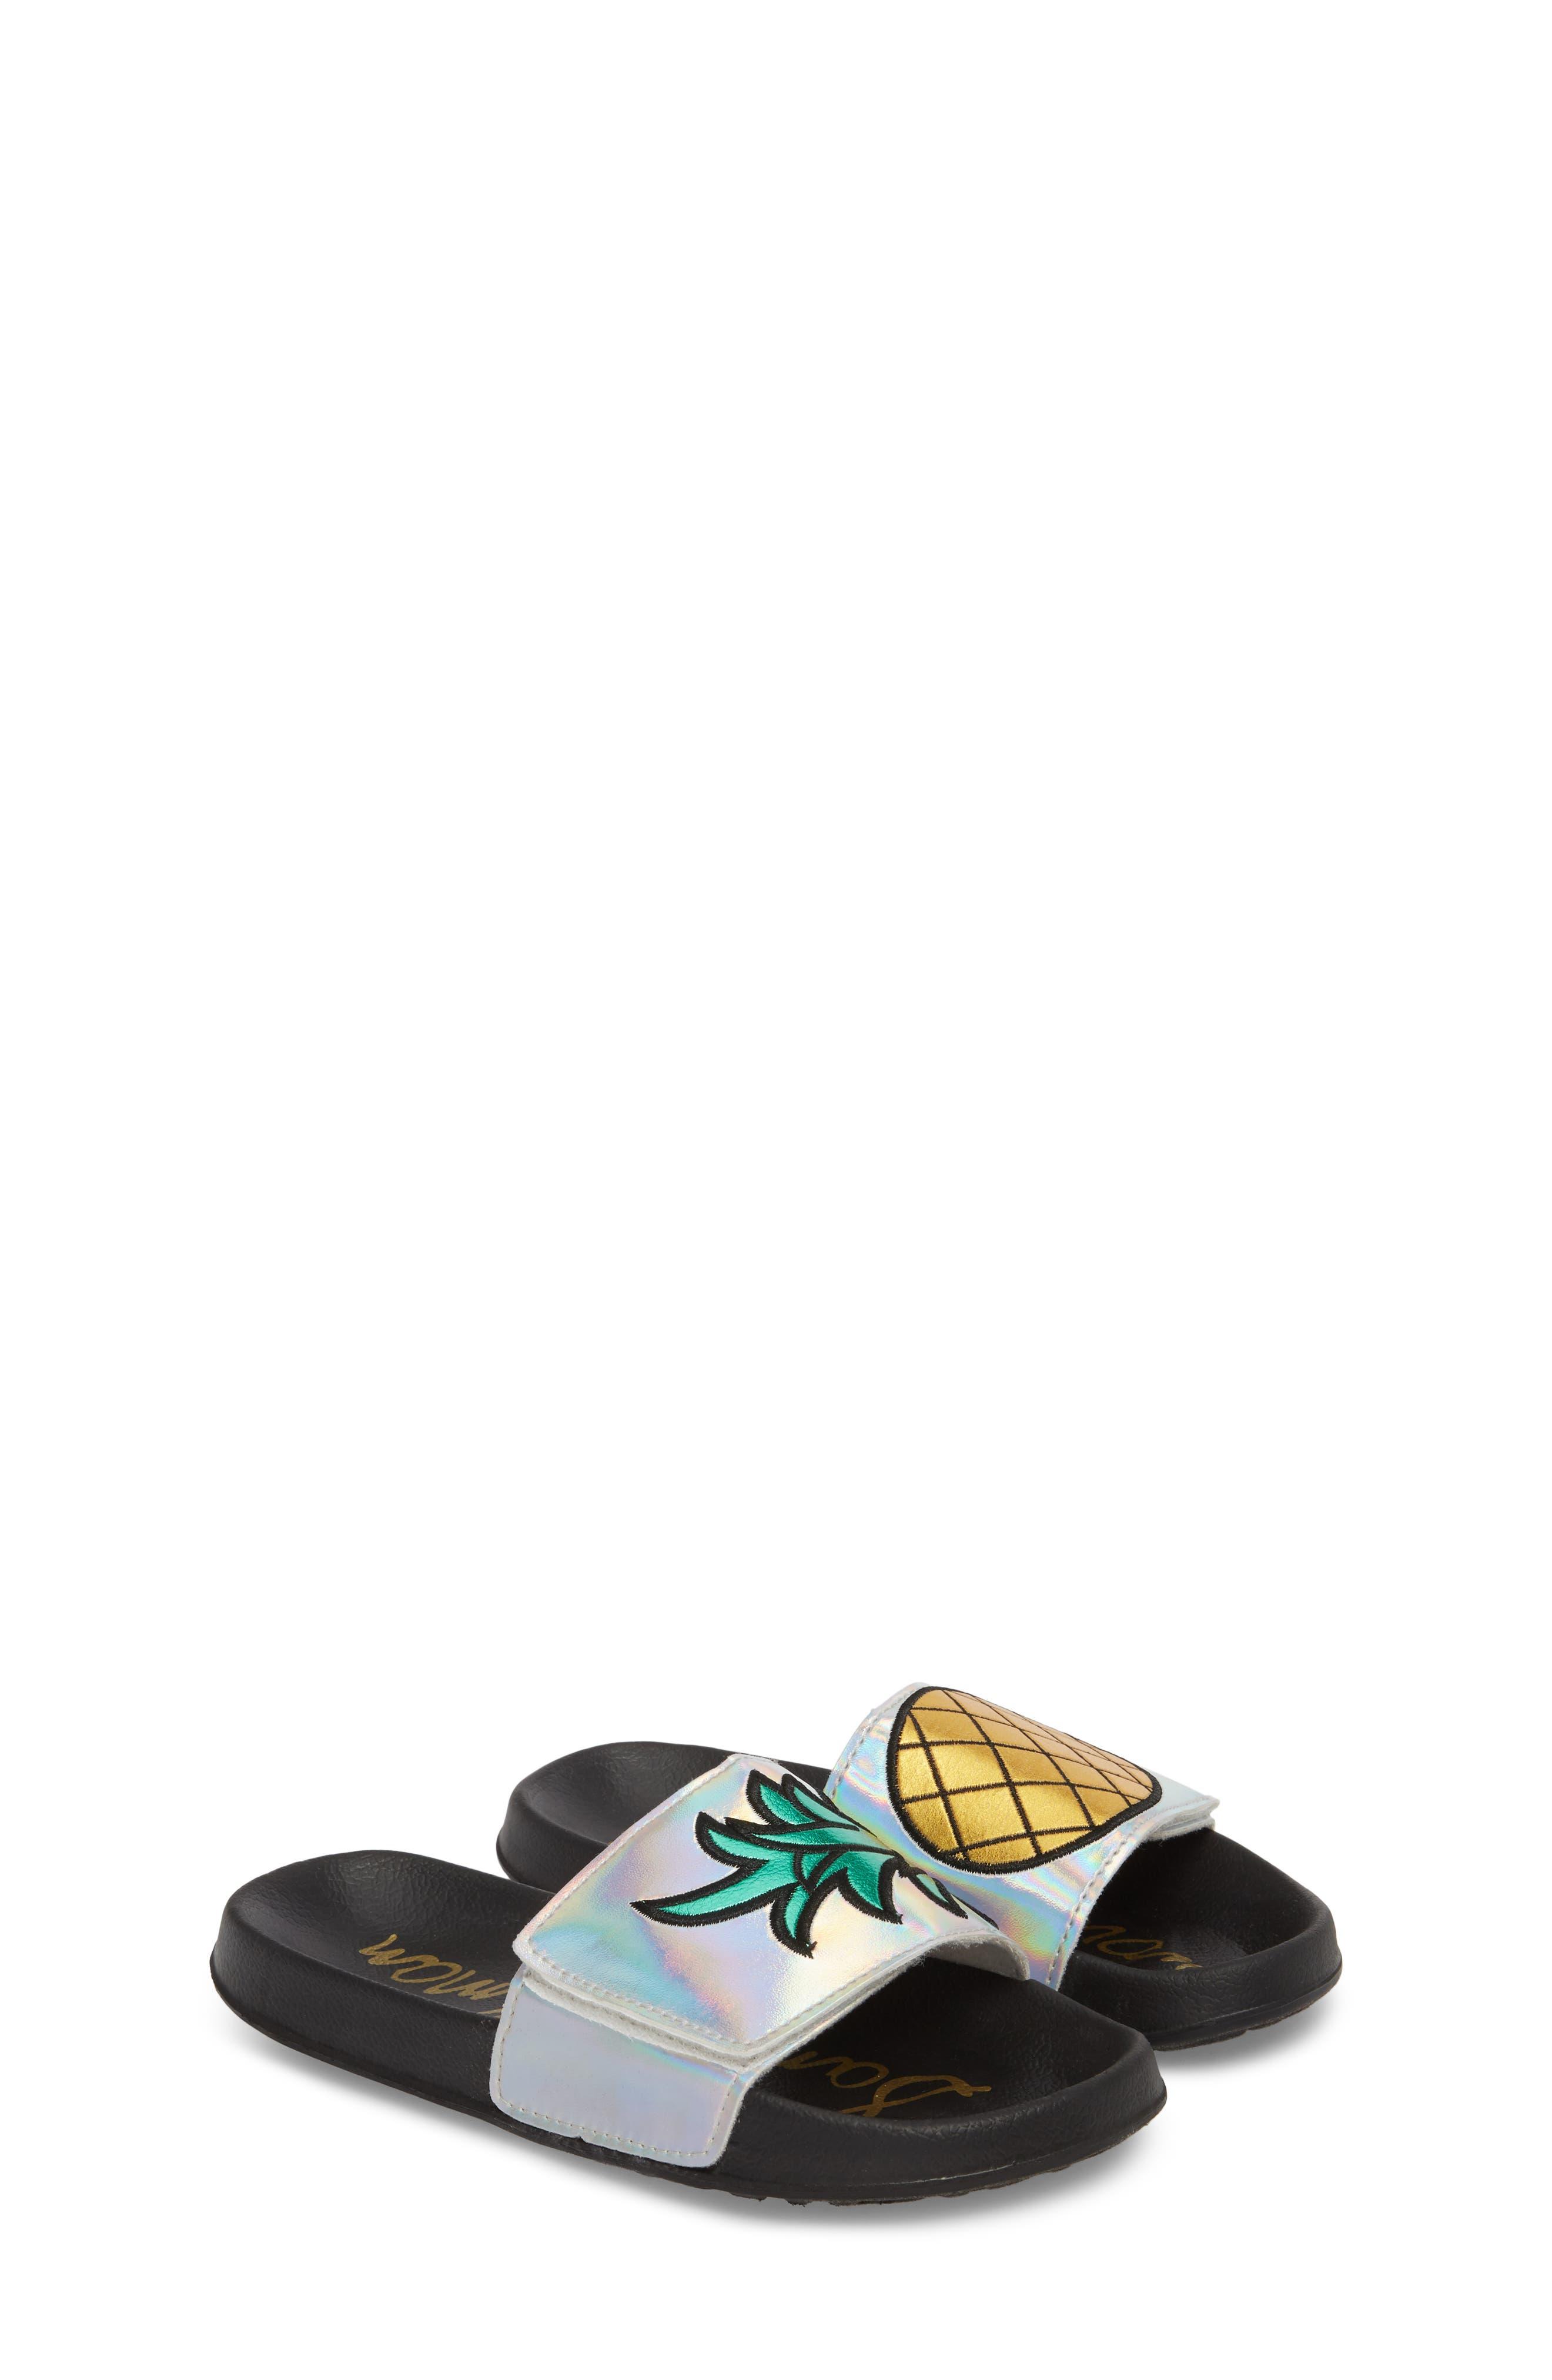 Alternate Image 2  - Sam Edelman Mackie Pineapple Metallic Slide Sandal (Toddler, Little Kid & Big Kid)